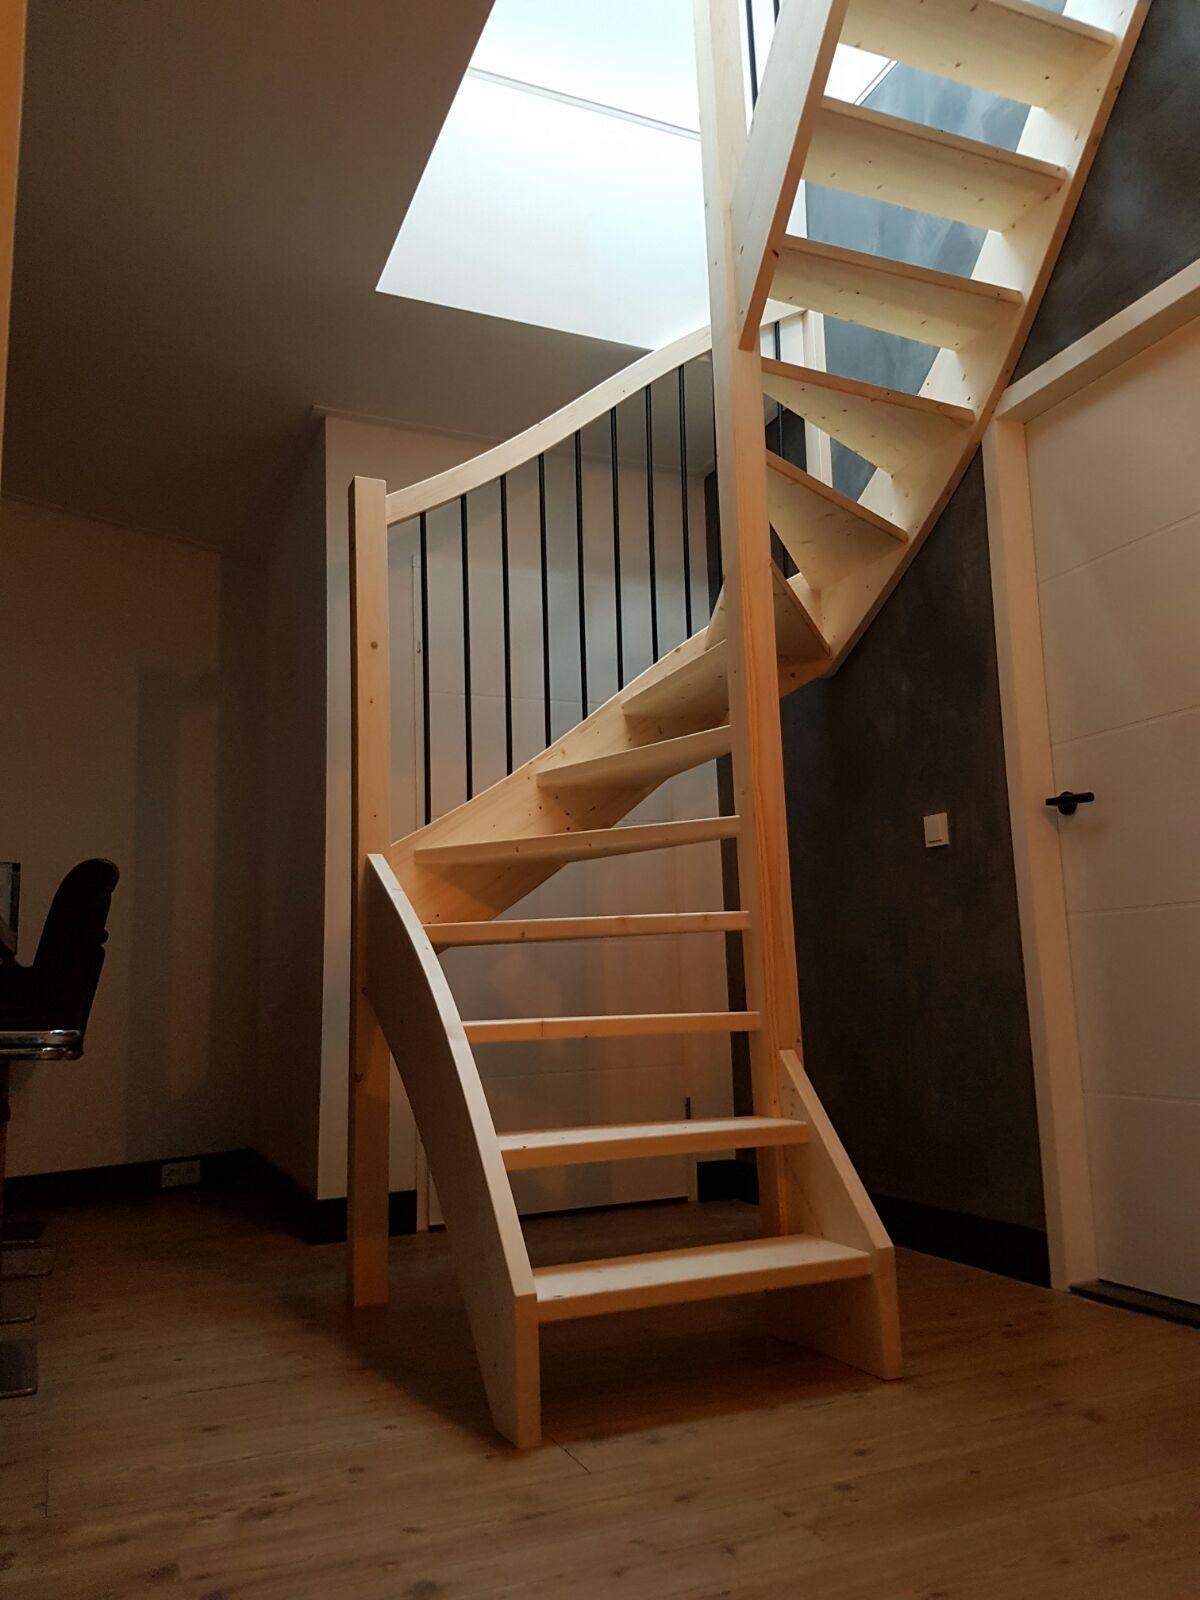 Onze trappenfabriek onze meest verkochte houten trap for Houten trap plaatsen